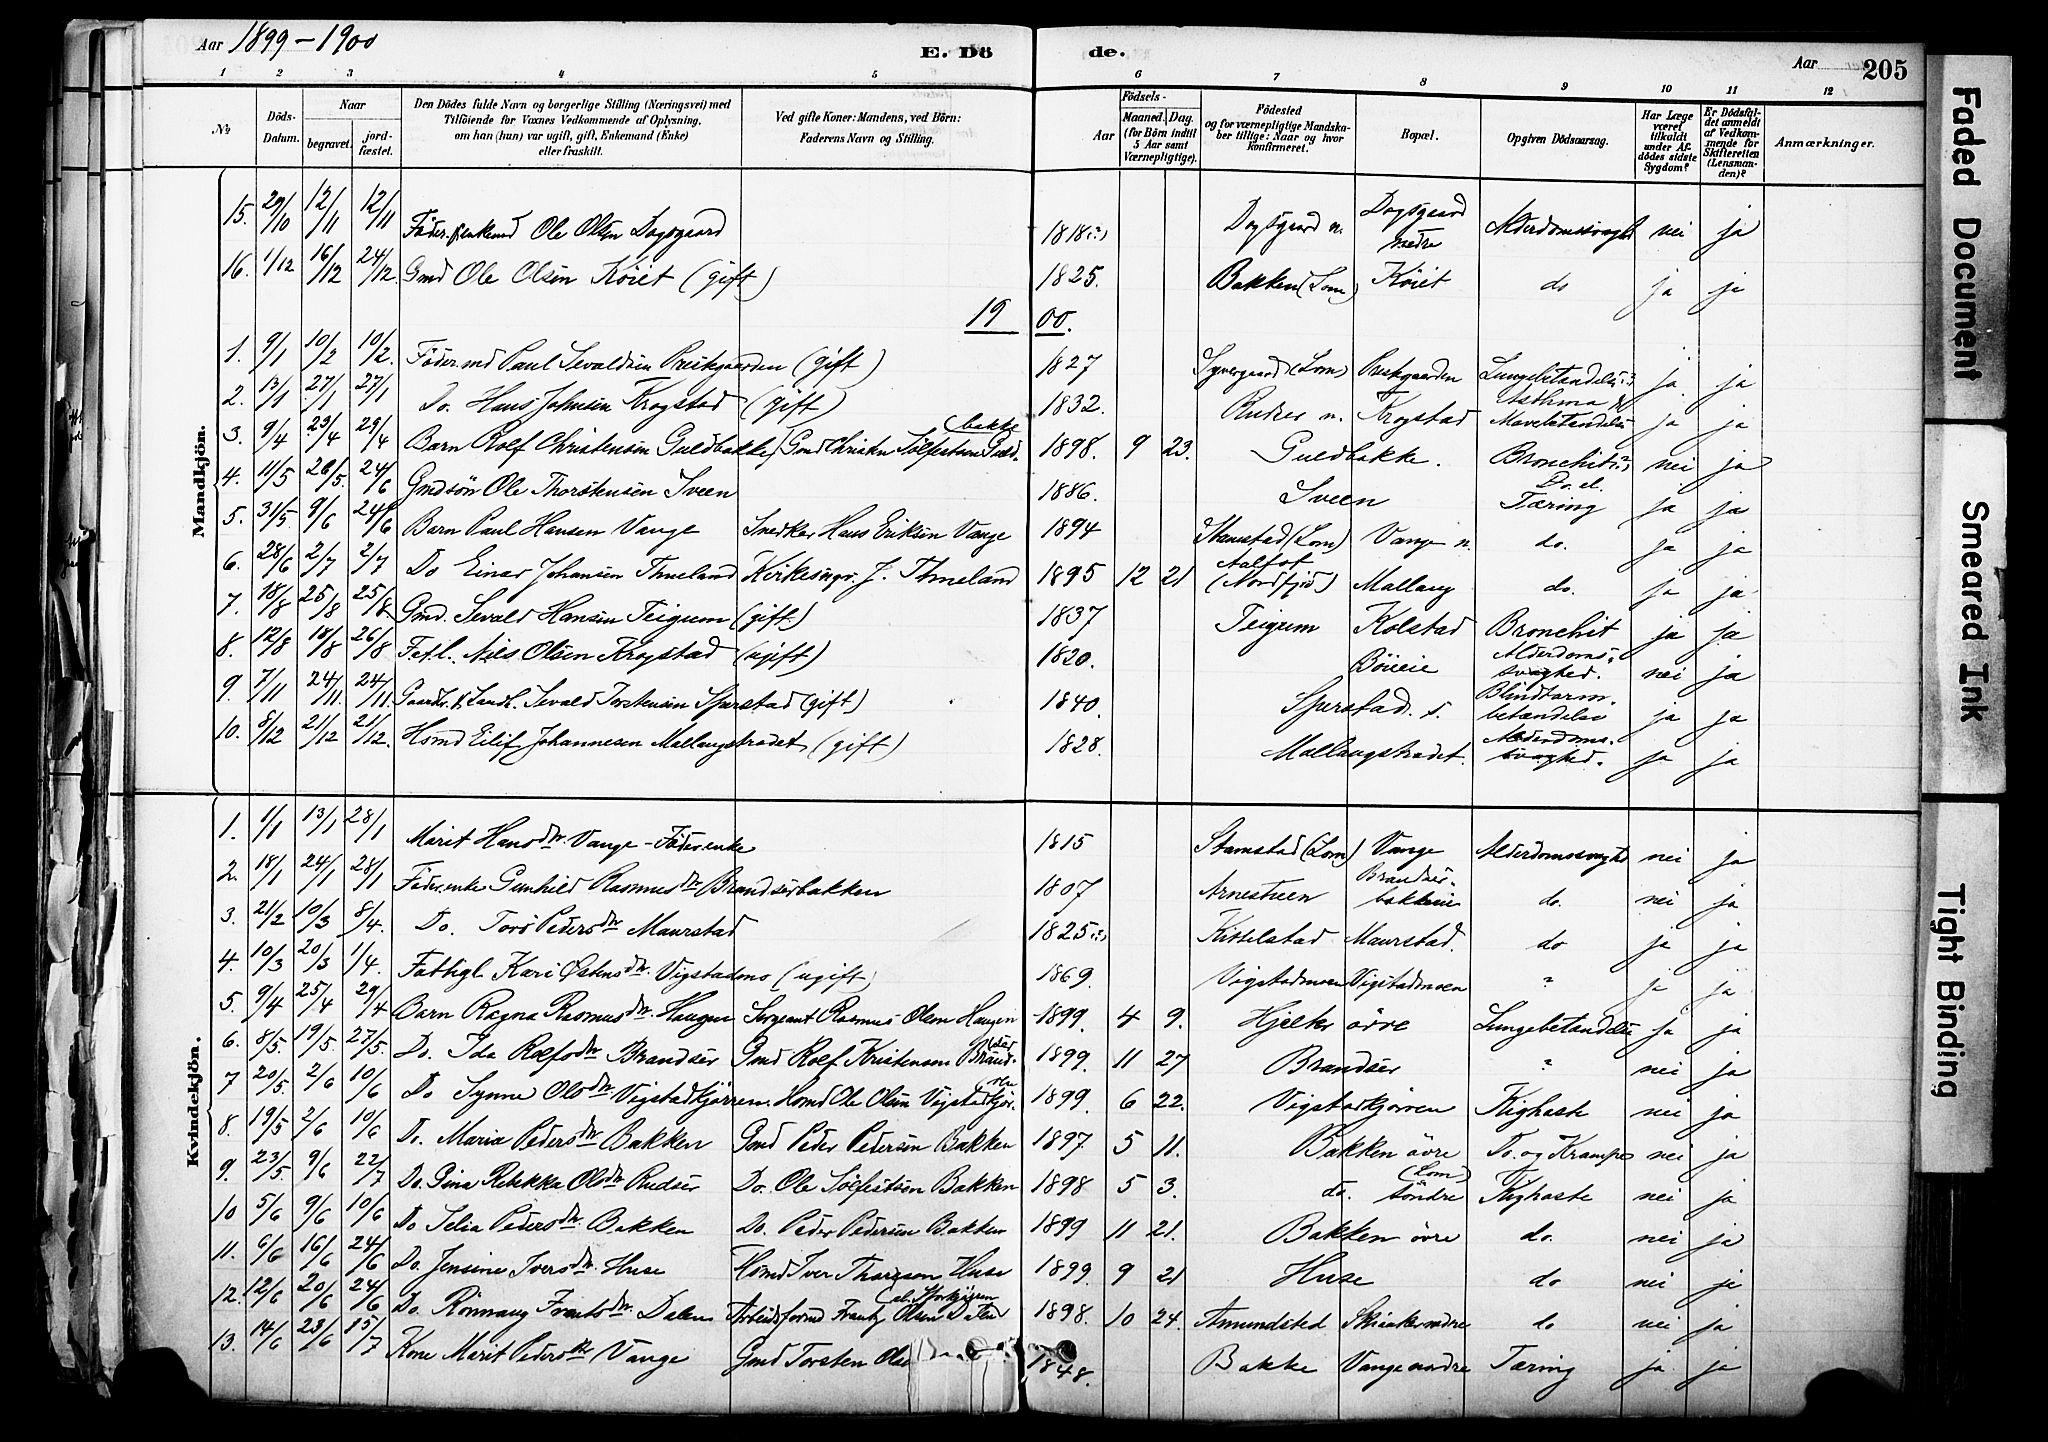 SAH, Skjåk prestekontor, Ministerialbok nr. 3, 1880-1907, s. 205